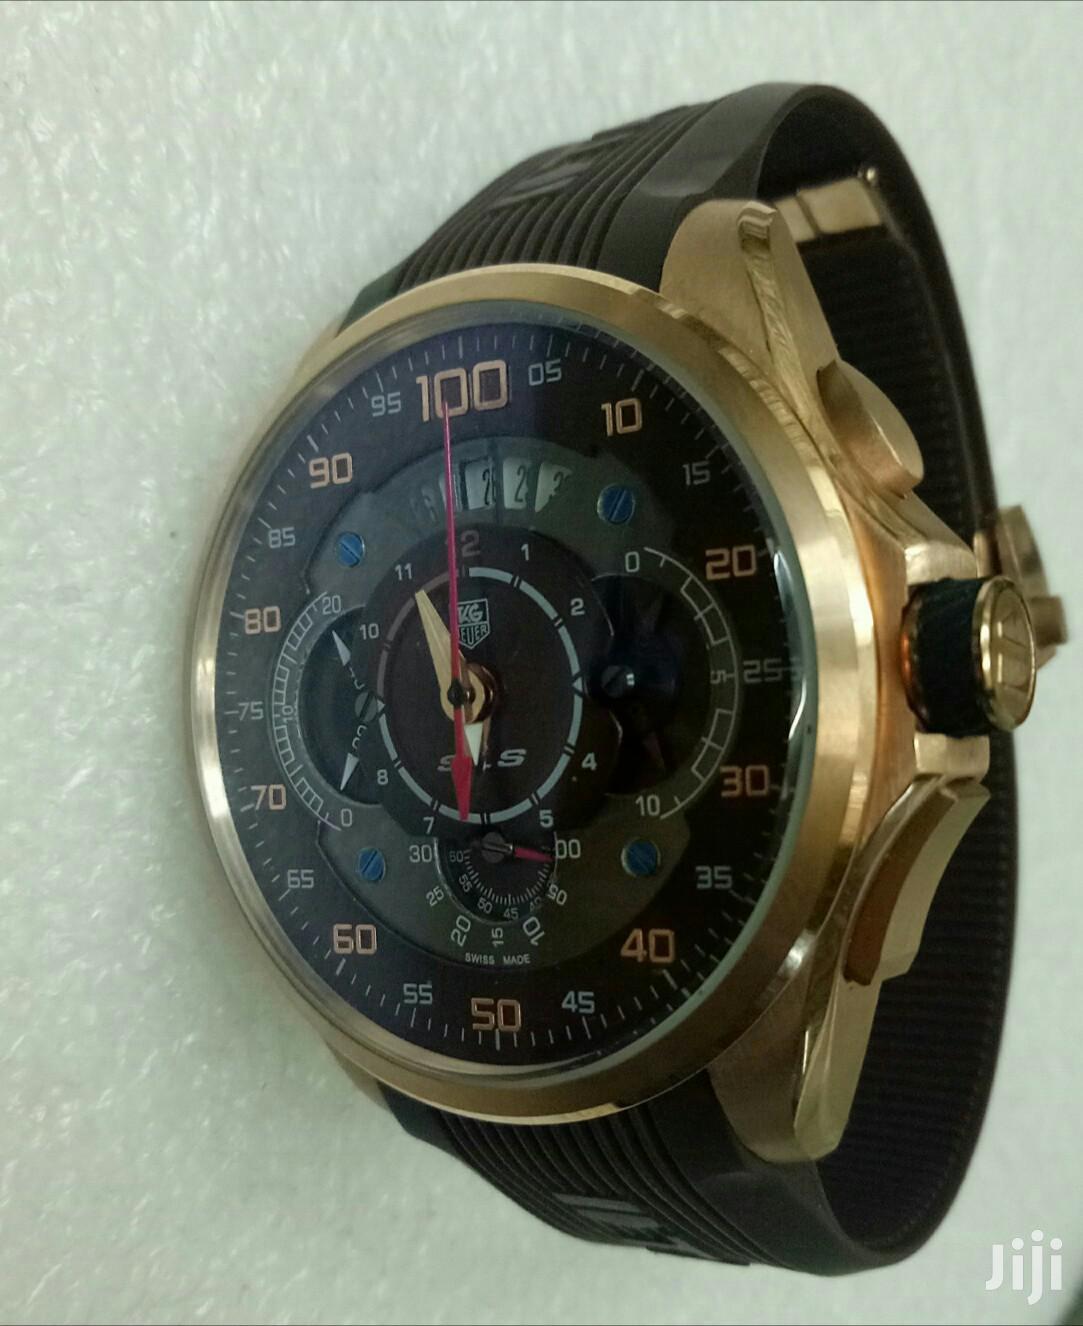 Mercedes-Benz Gold Watch | Watches for sale in Nairobi Central, Nairobi, Kenya